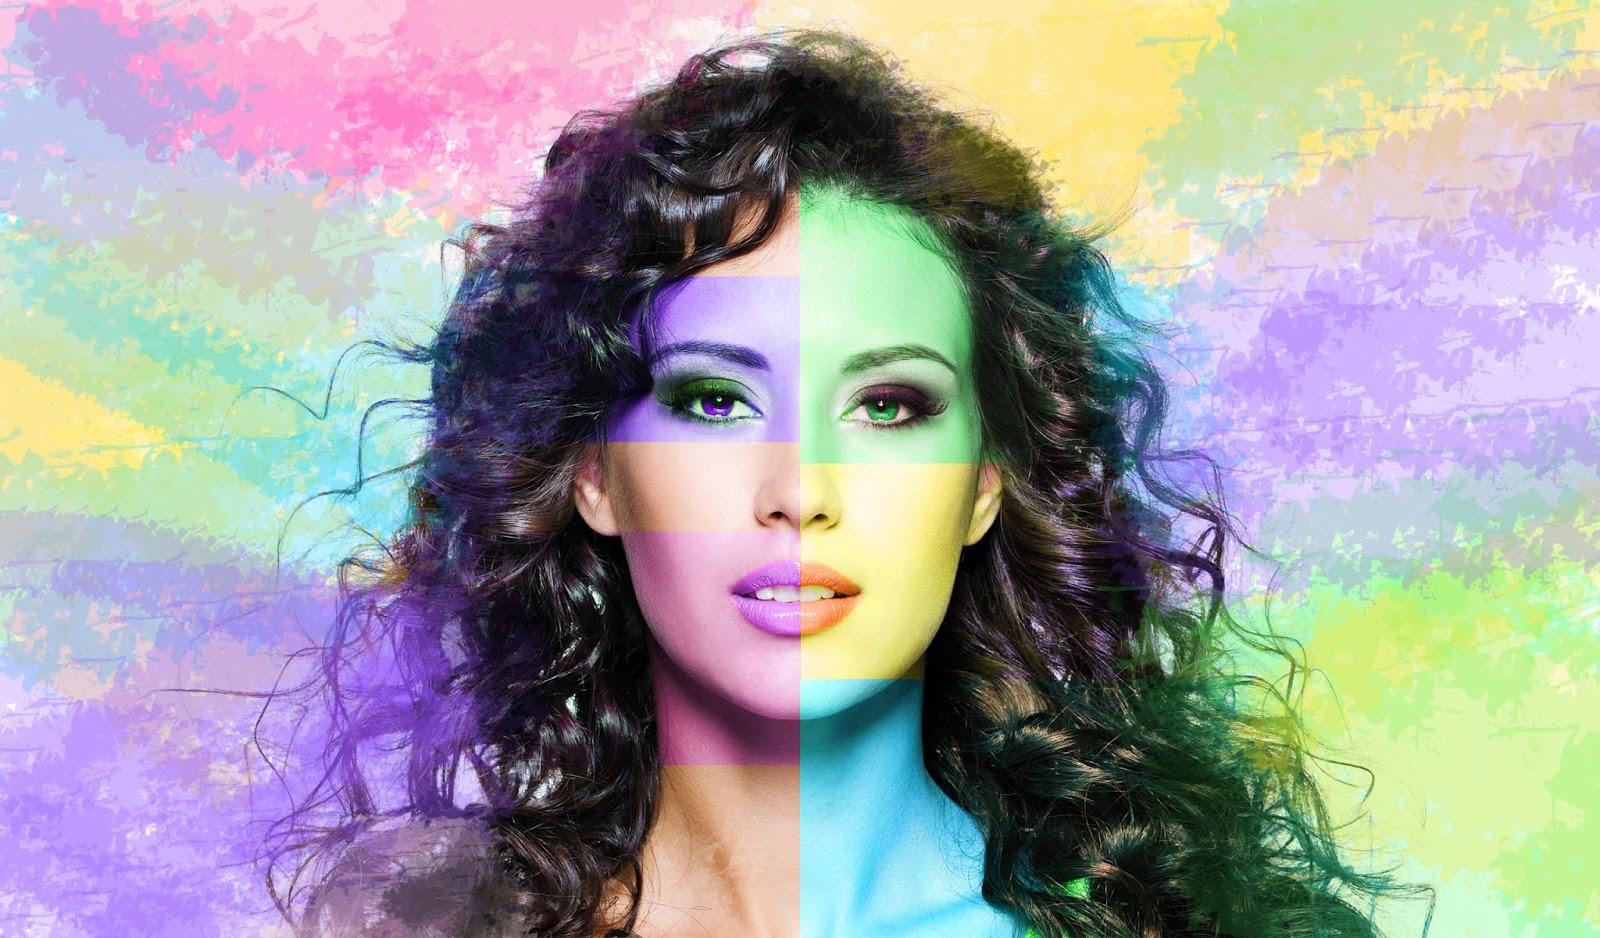 Face Color Effects Tutorial in Adobe Photoshop CC | Ju Joy